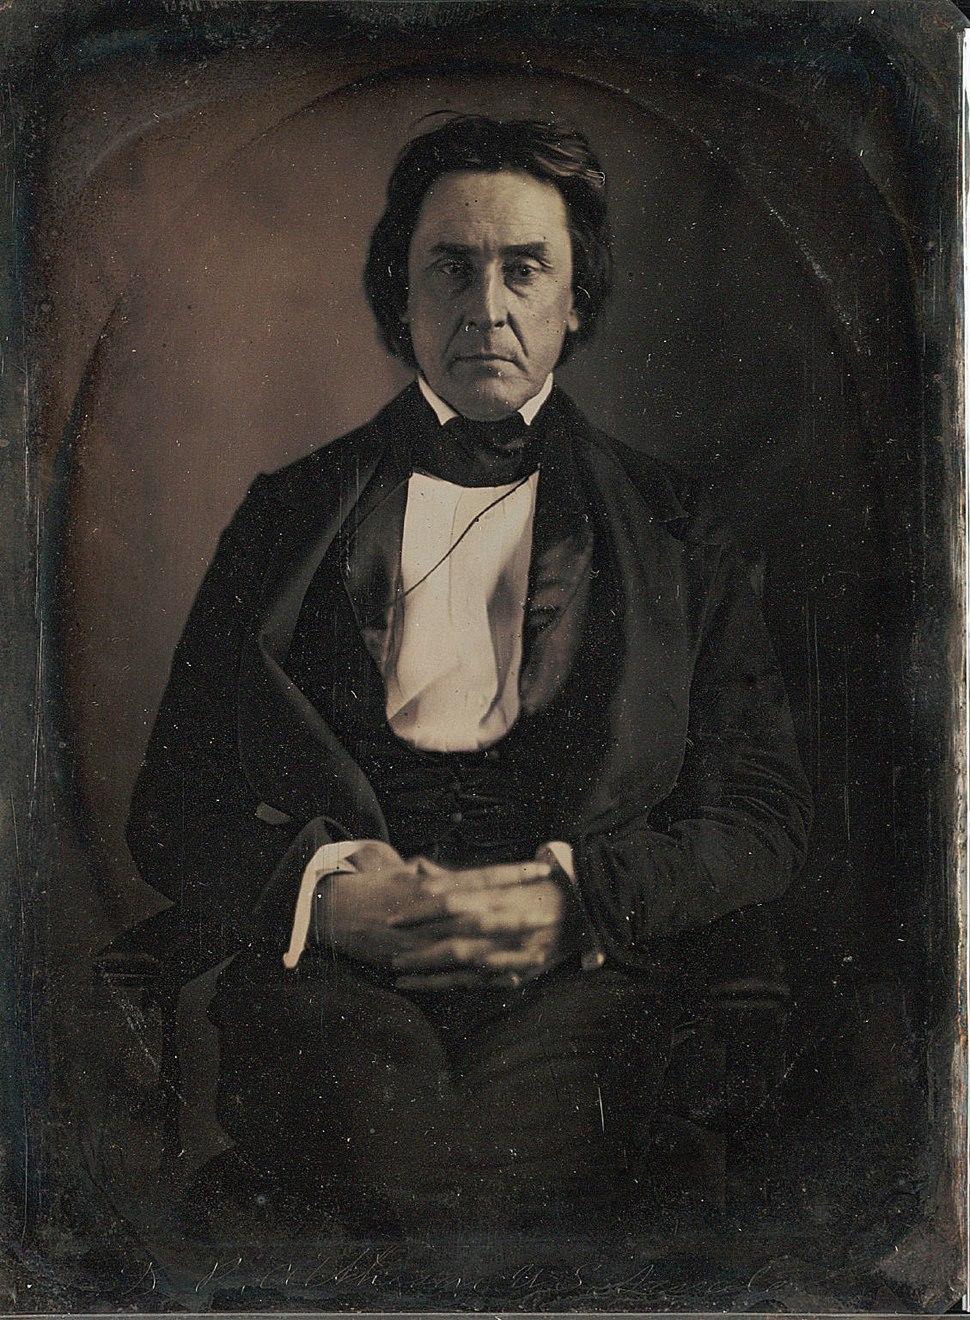 David Rice Atchison by Mathew Brady March 1849